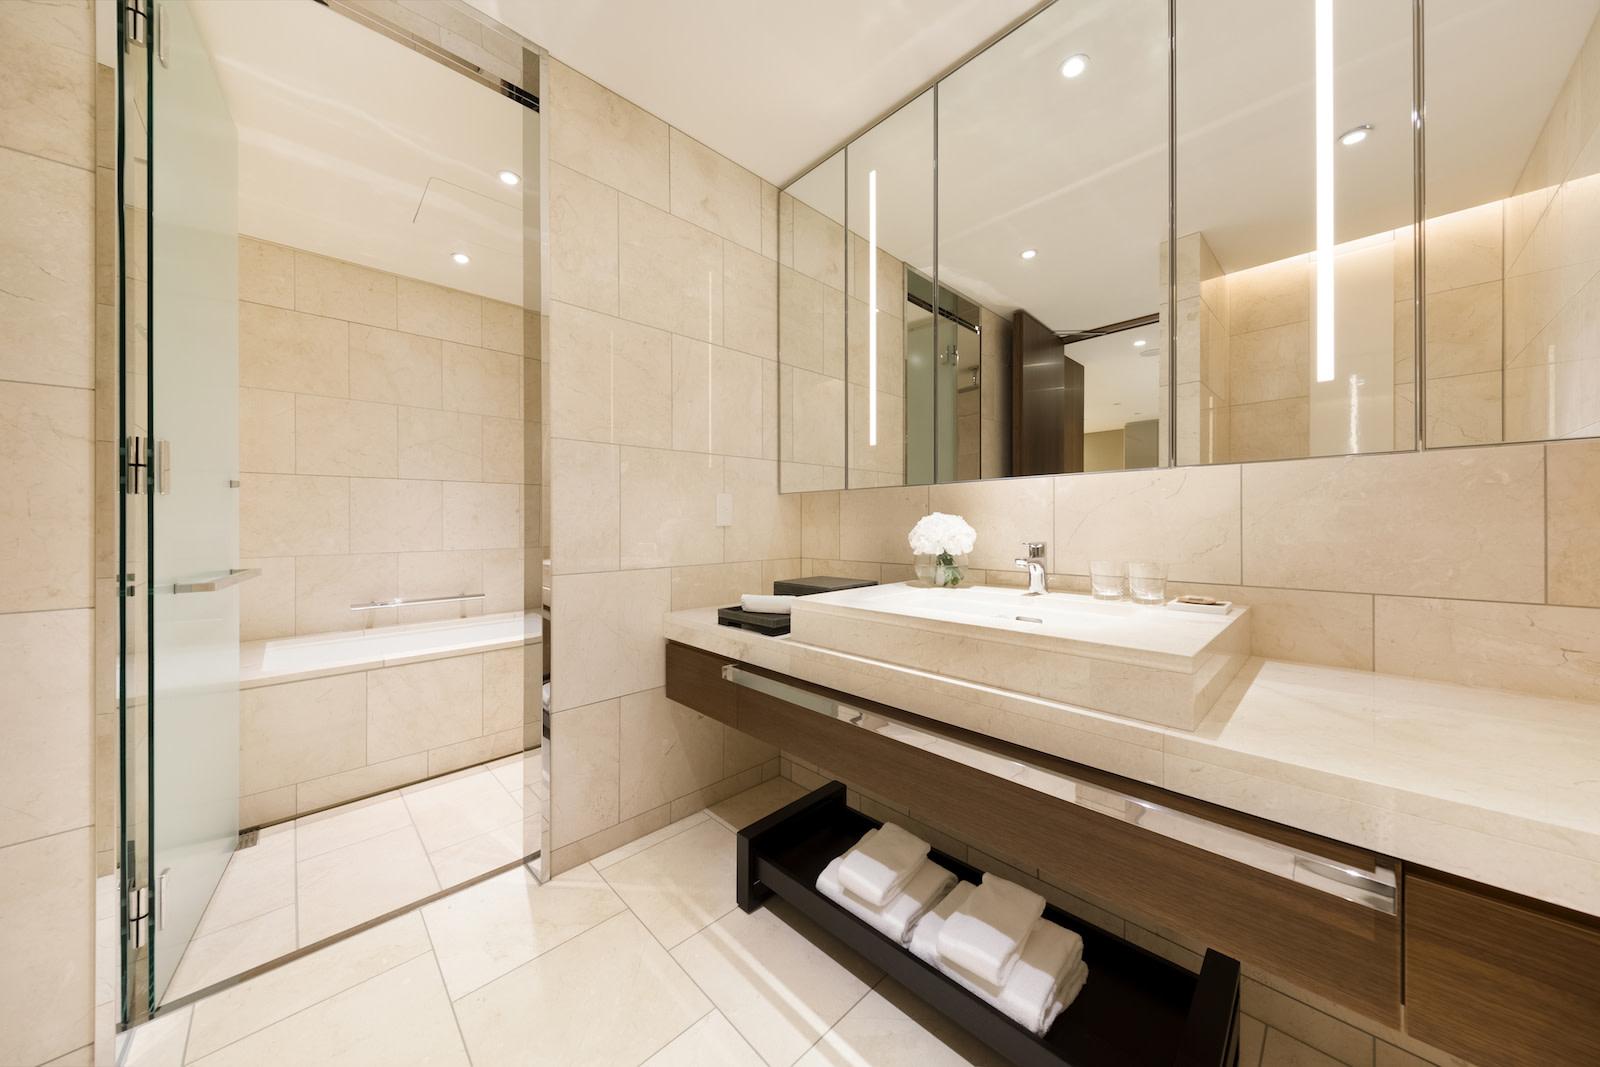 SR Japan Tokyo Asc Marunouchi Bathroom-HR アスコット丸の内東京 | Workations(ワーケーションズ)